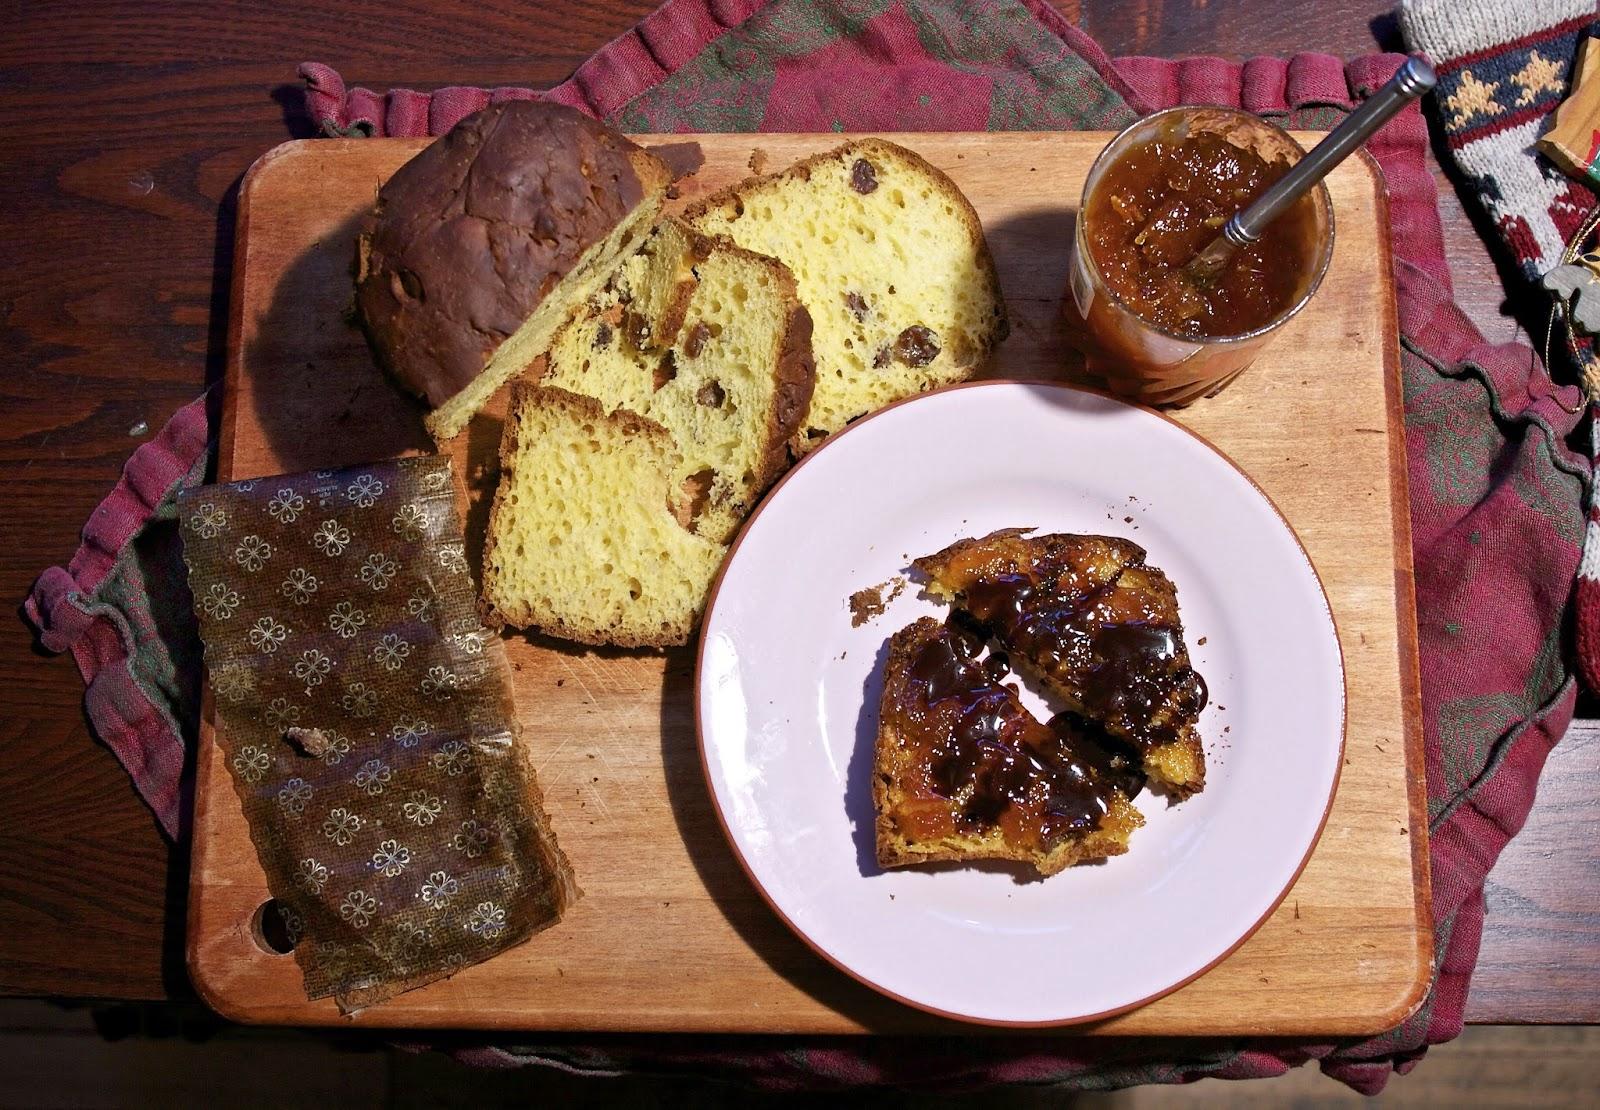 Quick & Easy Panettone Dessert- simplelivingeating.com